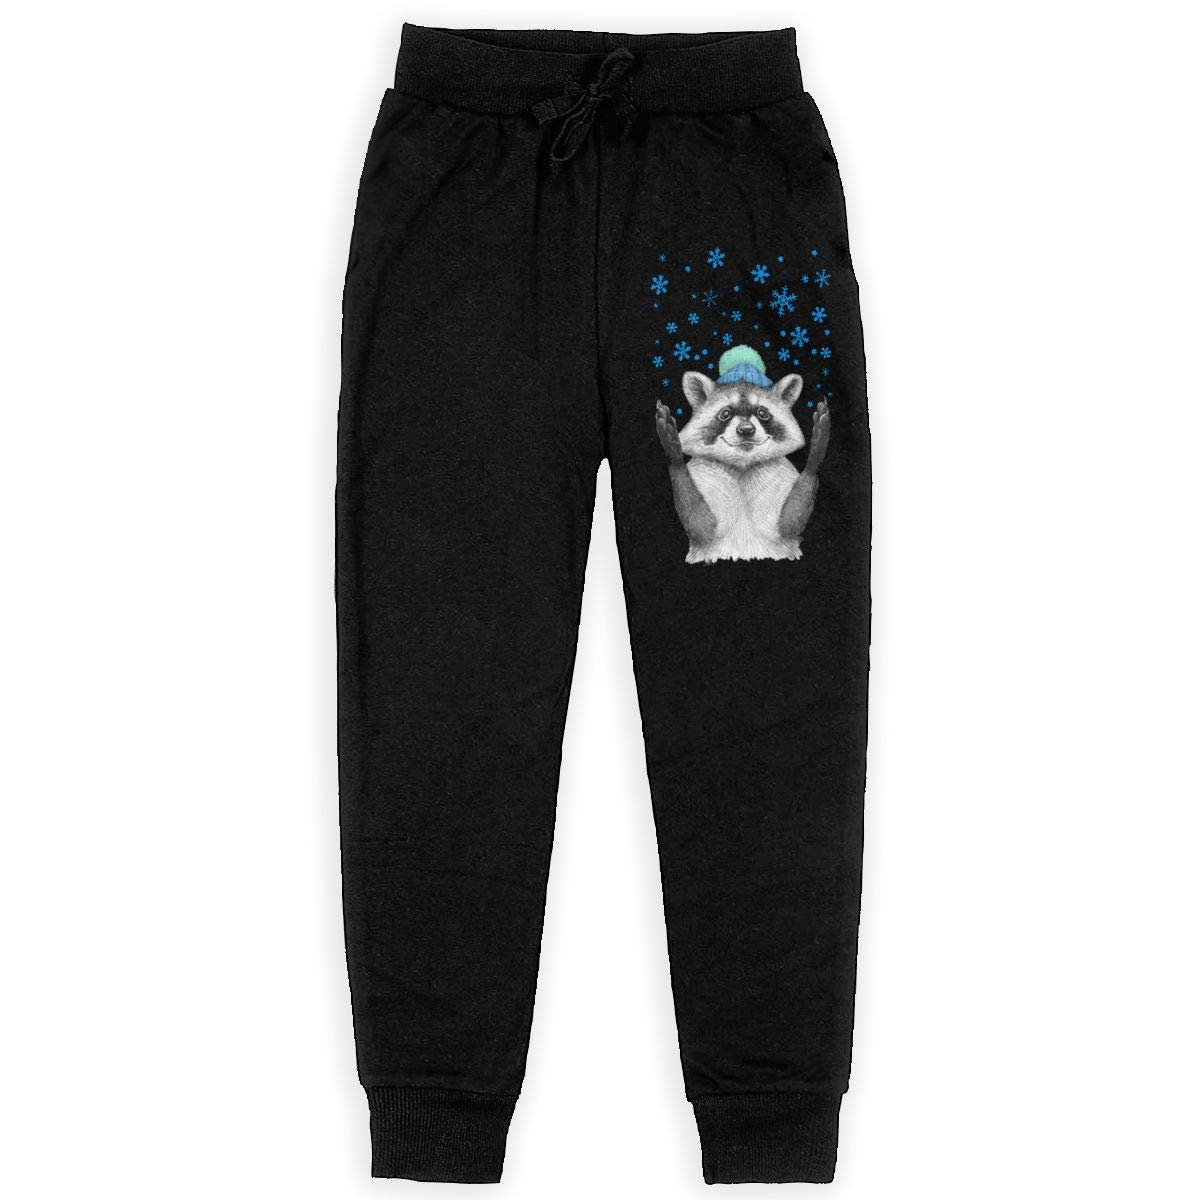 IufnNRJndfu Raccoon Boys Athletic Smart Fleece Pant Youth Soft and Cozy Sweatpants